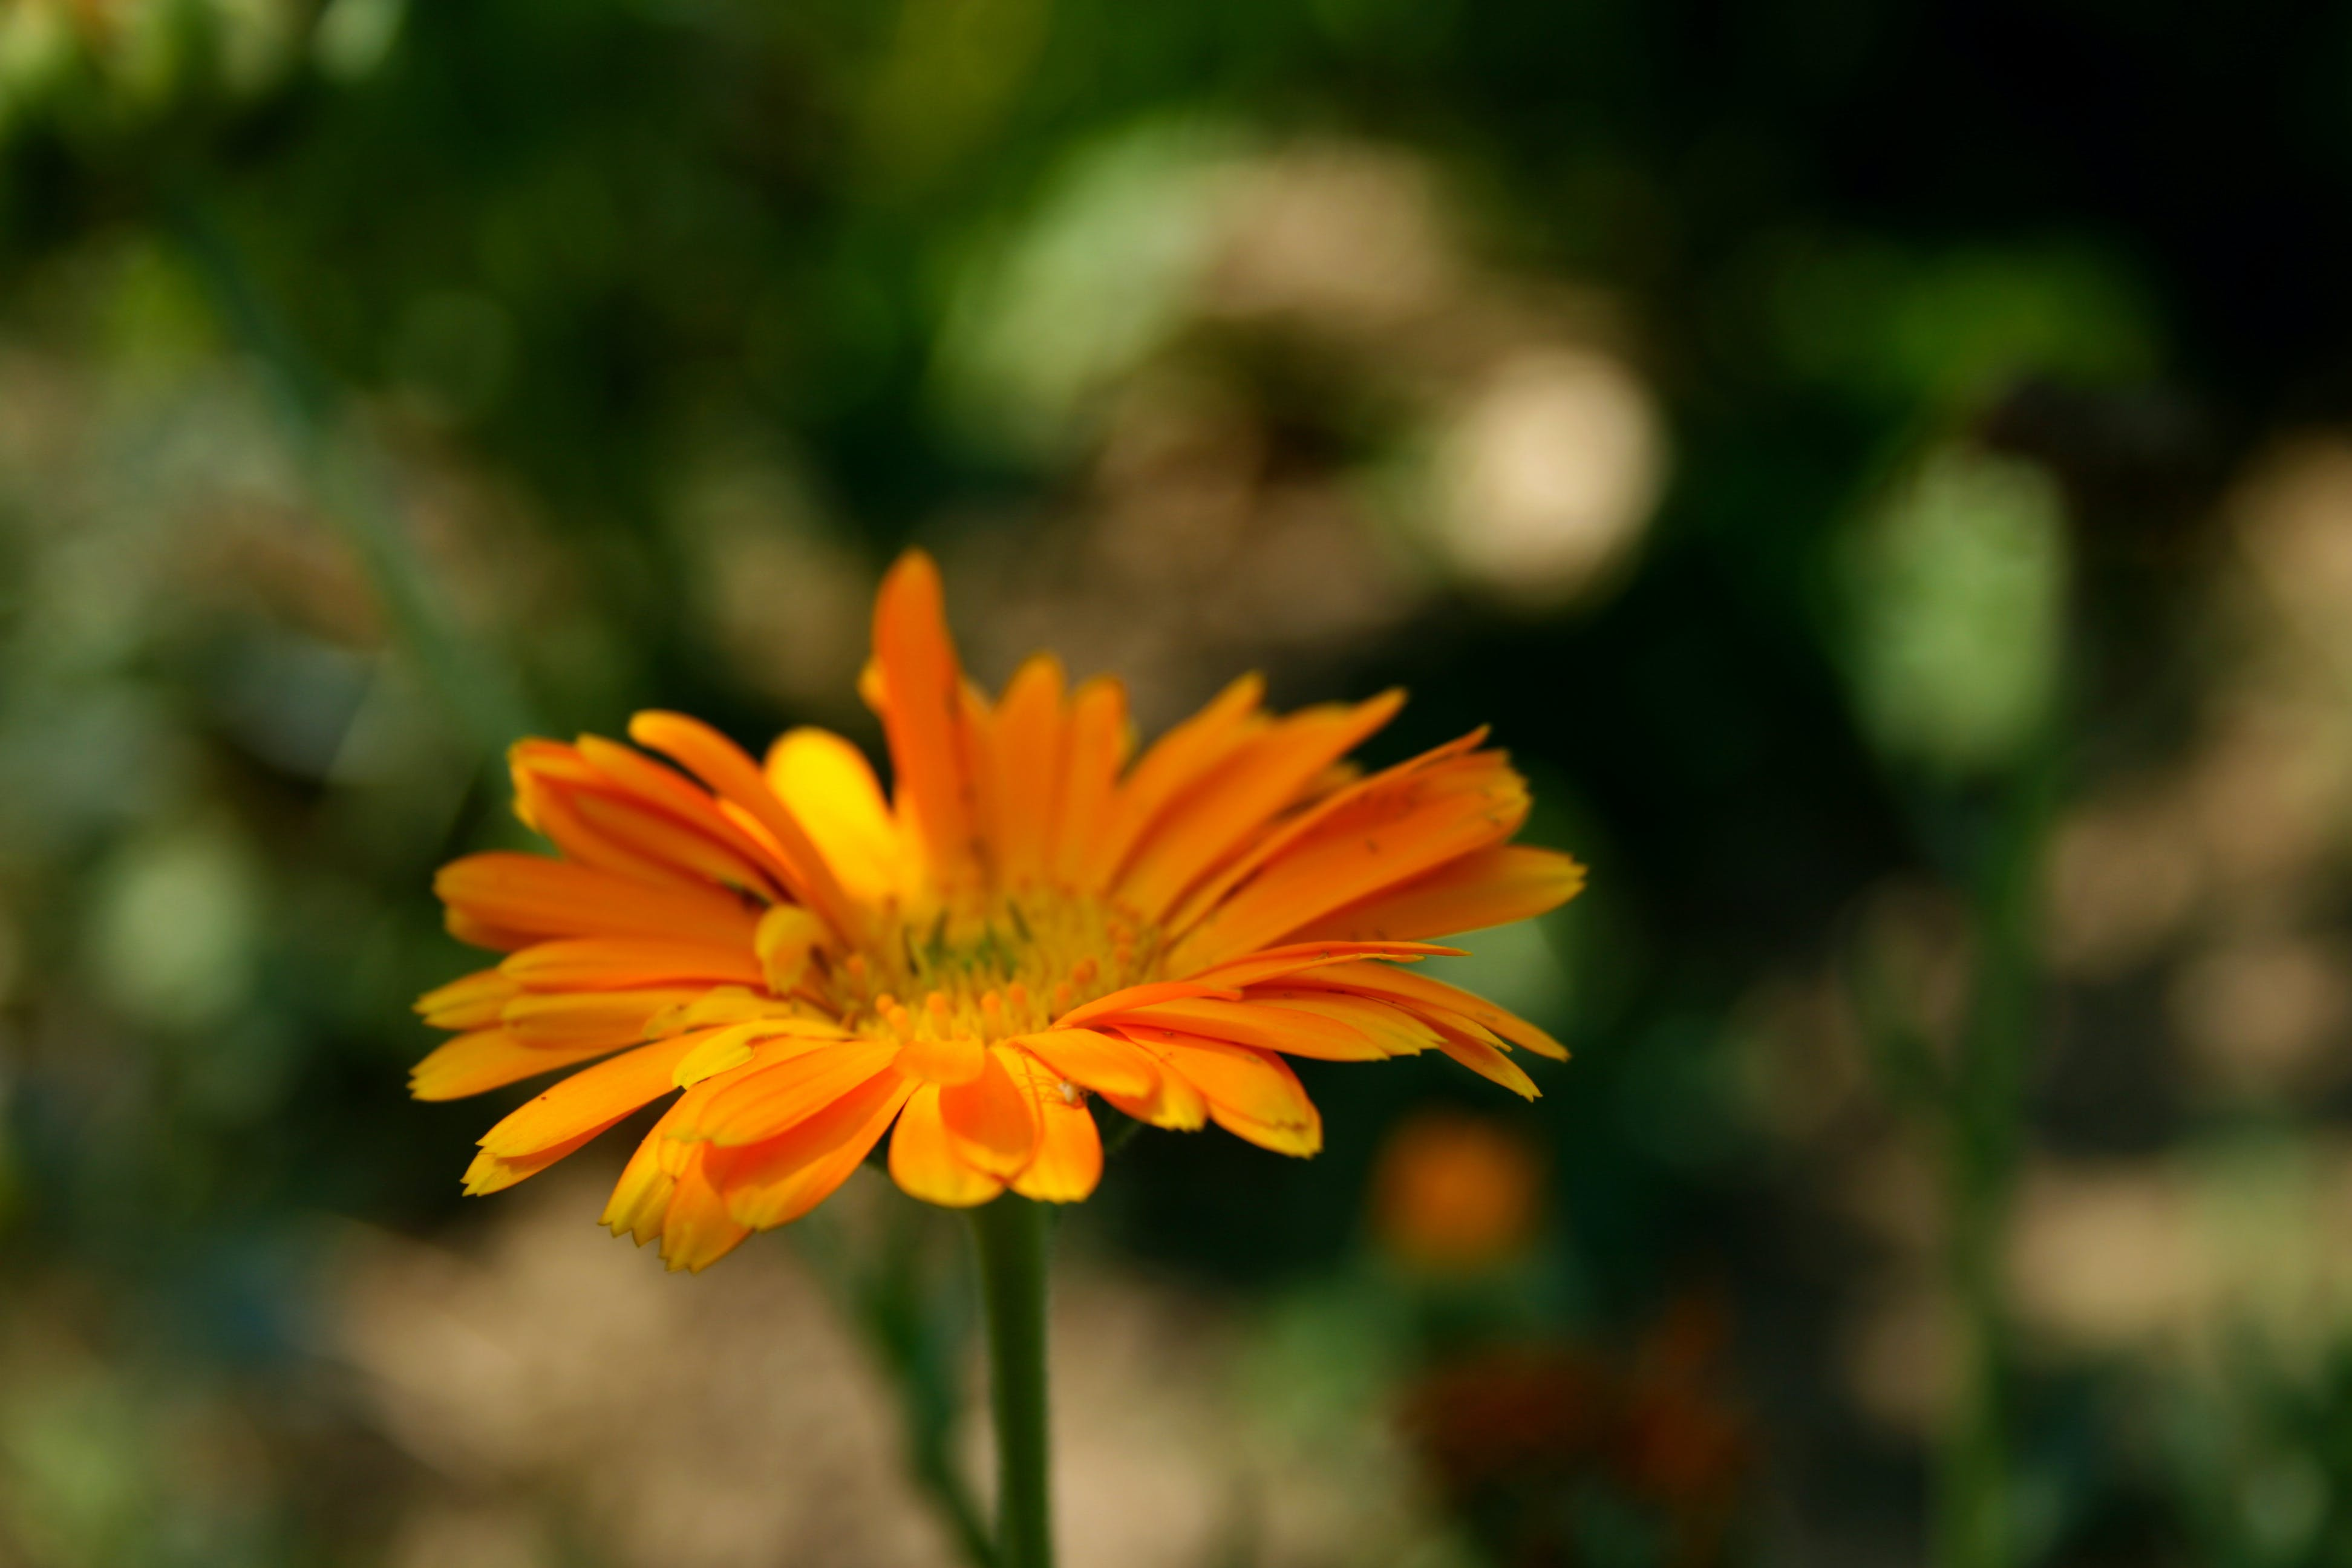 Free stock photo of garden flower, marigold, nature, orange flower